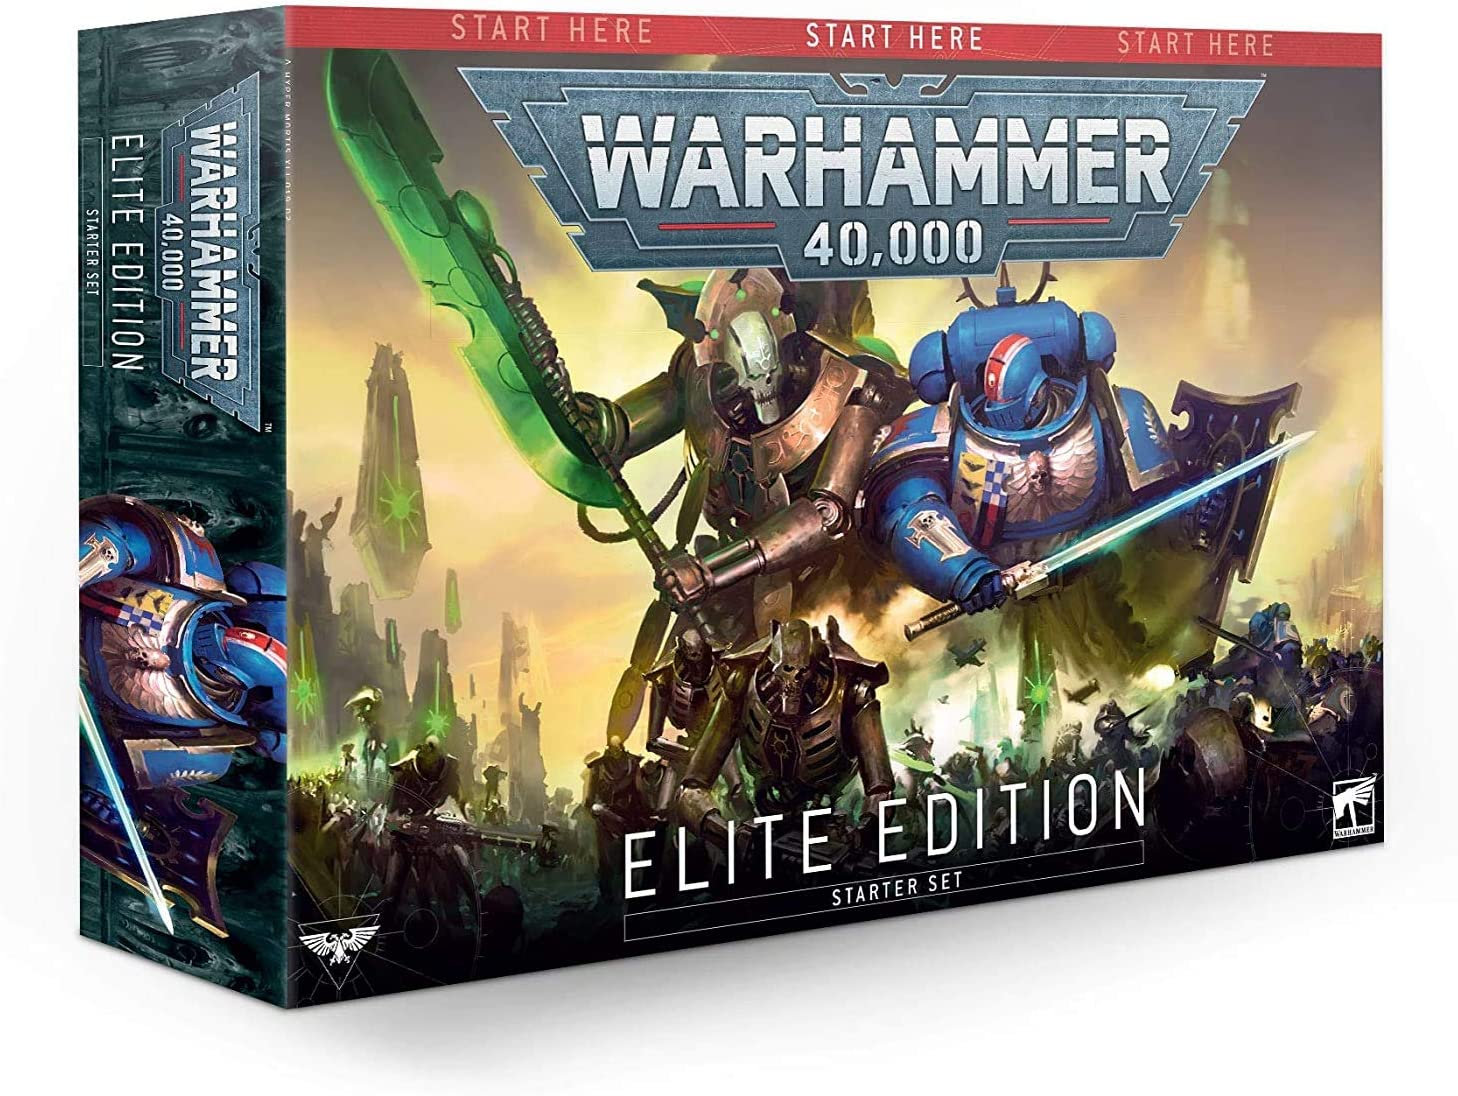 Games Workshop Warhammer 40,000 Elite Edition Starter Set: Amazon.es: Juguetes y juegos